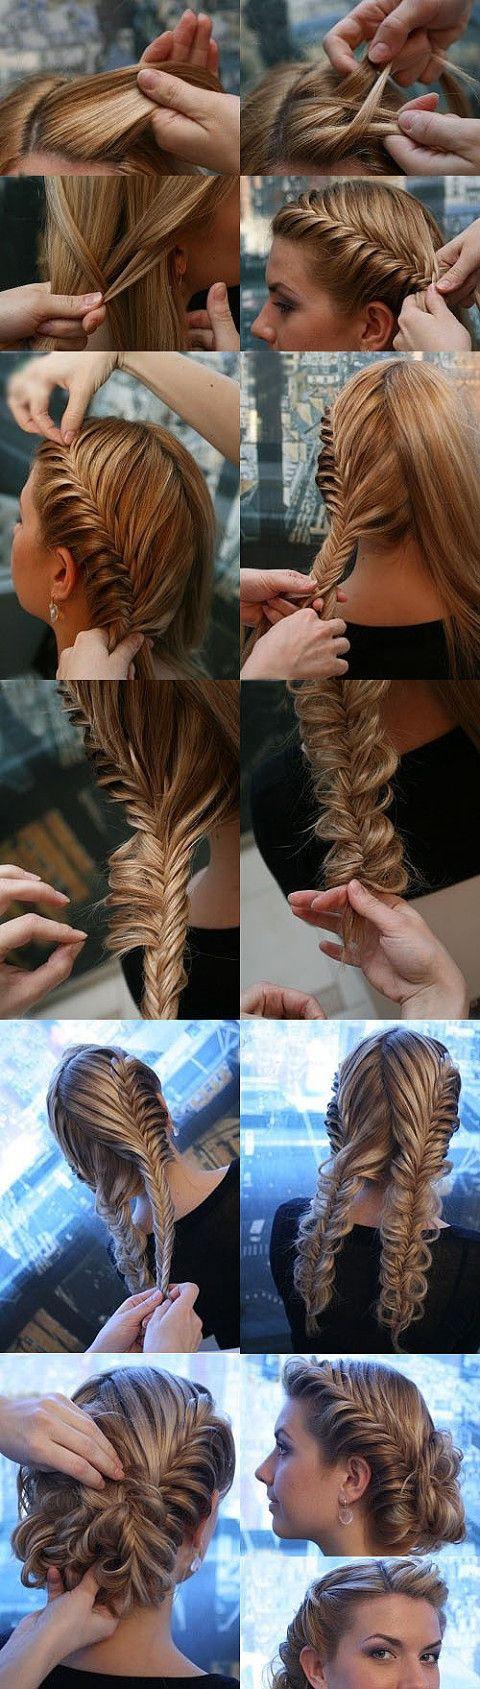 krásné vlasy a účes